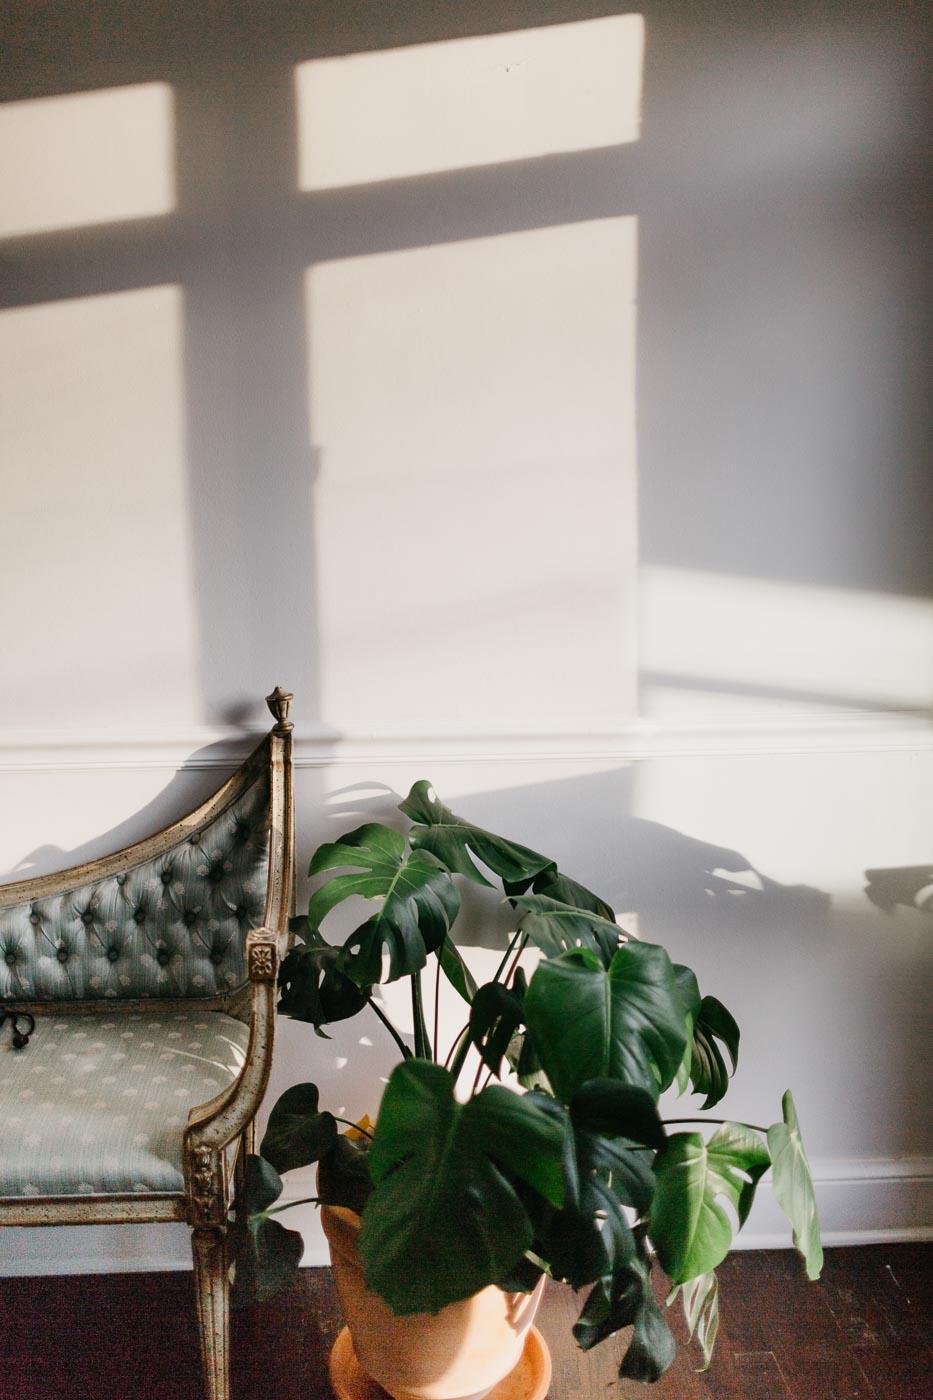 cozy-casa-nashville-tn-natural-light-studio-photography-ideas-lifestyle-photographer-photography-31.jpg